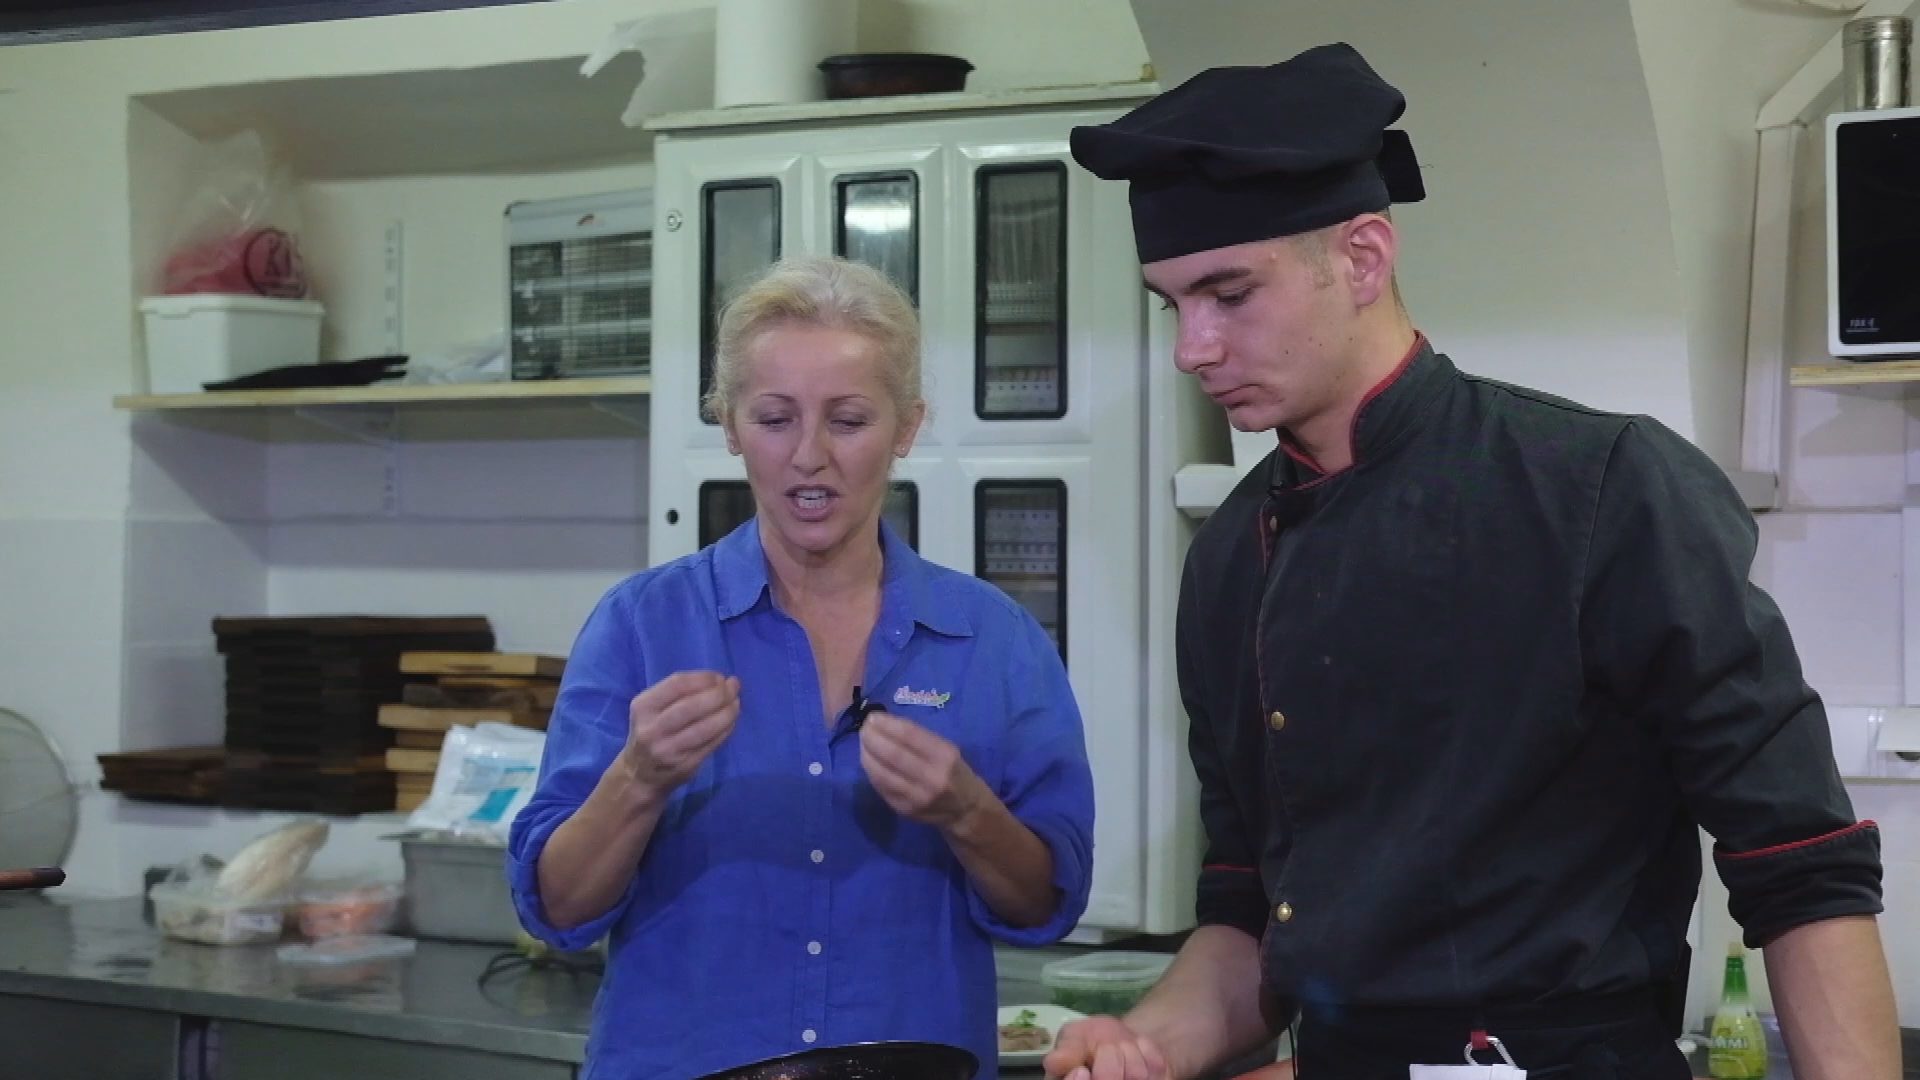 Cooking and Kids Season Season 2 Ep 5 4CNC shows